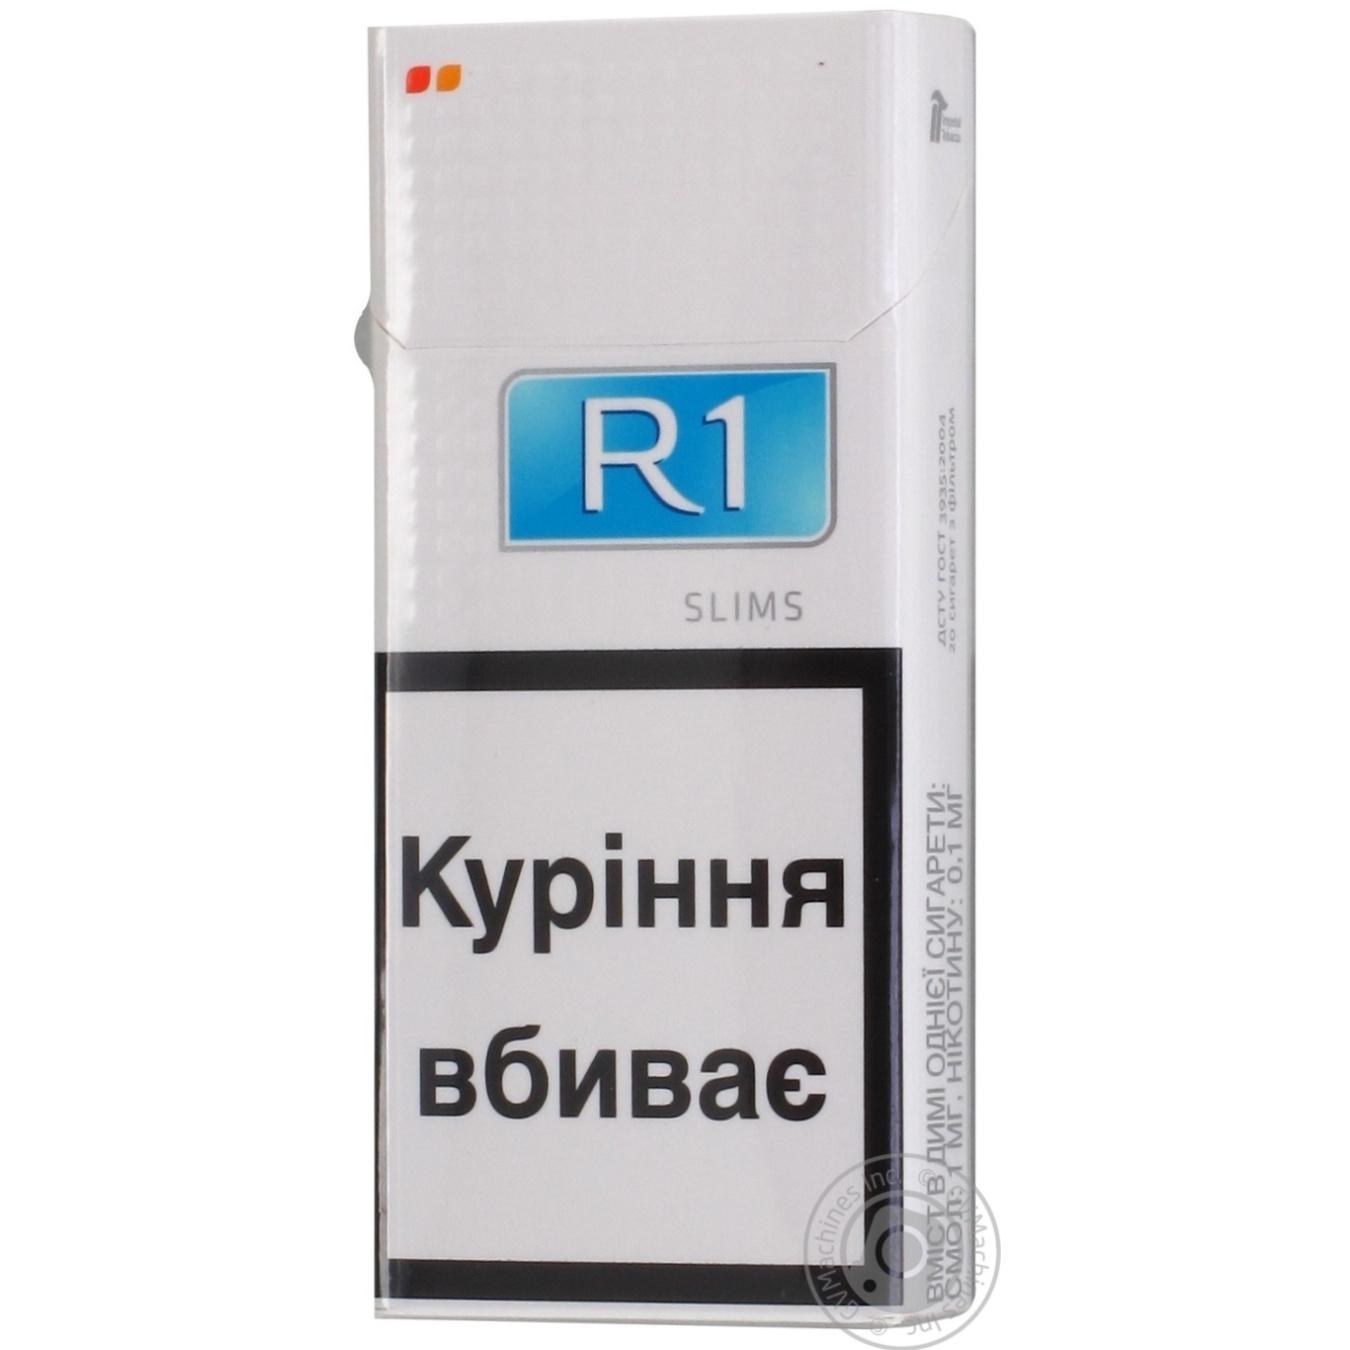 Free cigarettes Marlboro online